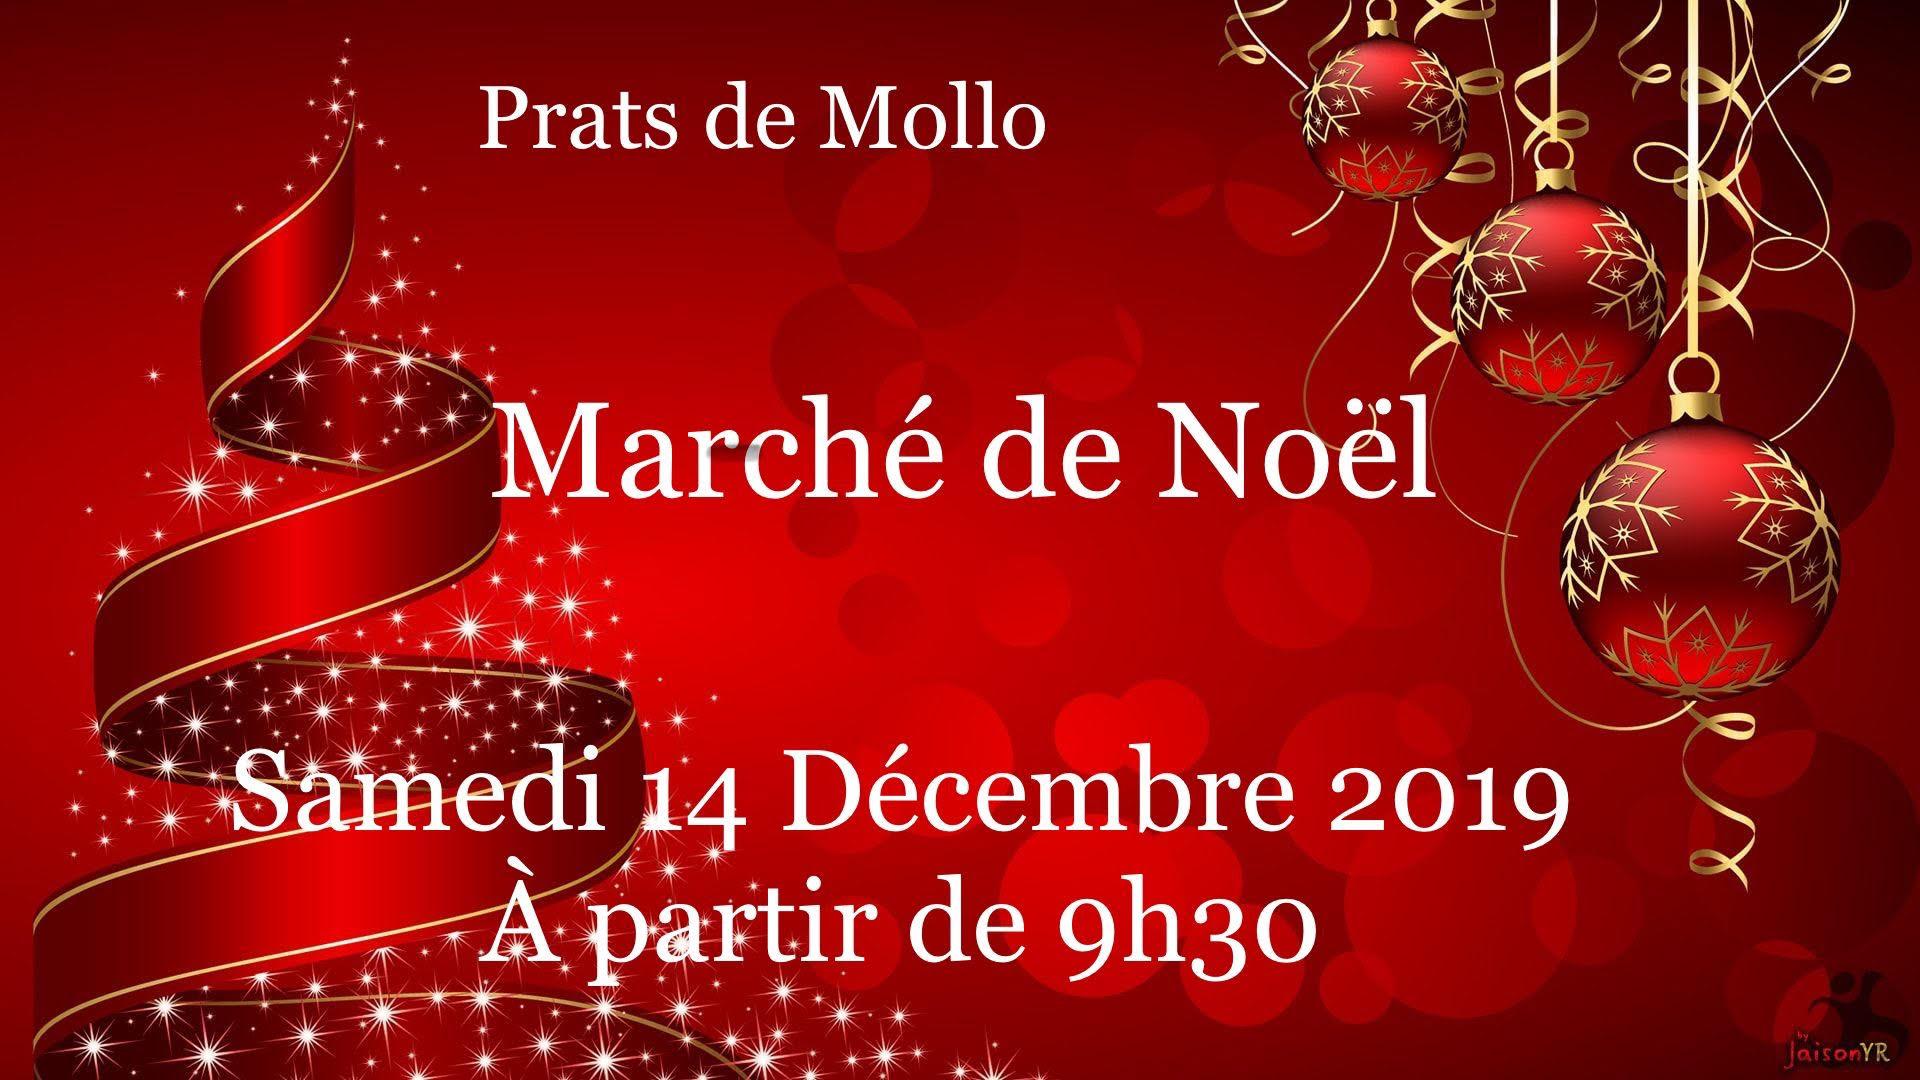 Marché de Noël artisanal